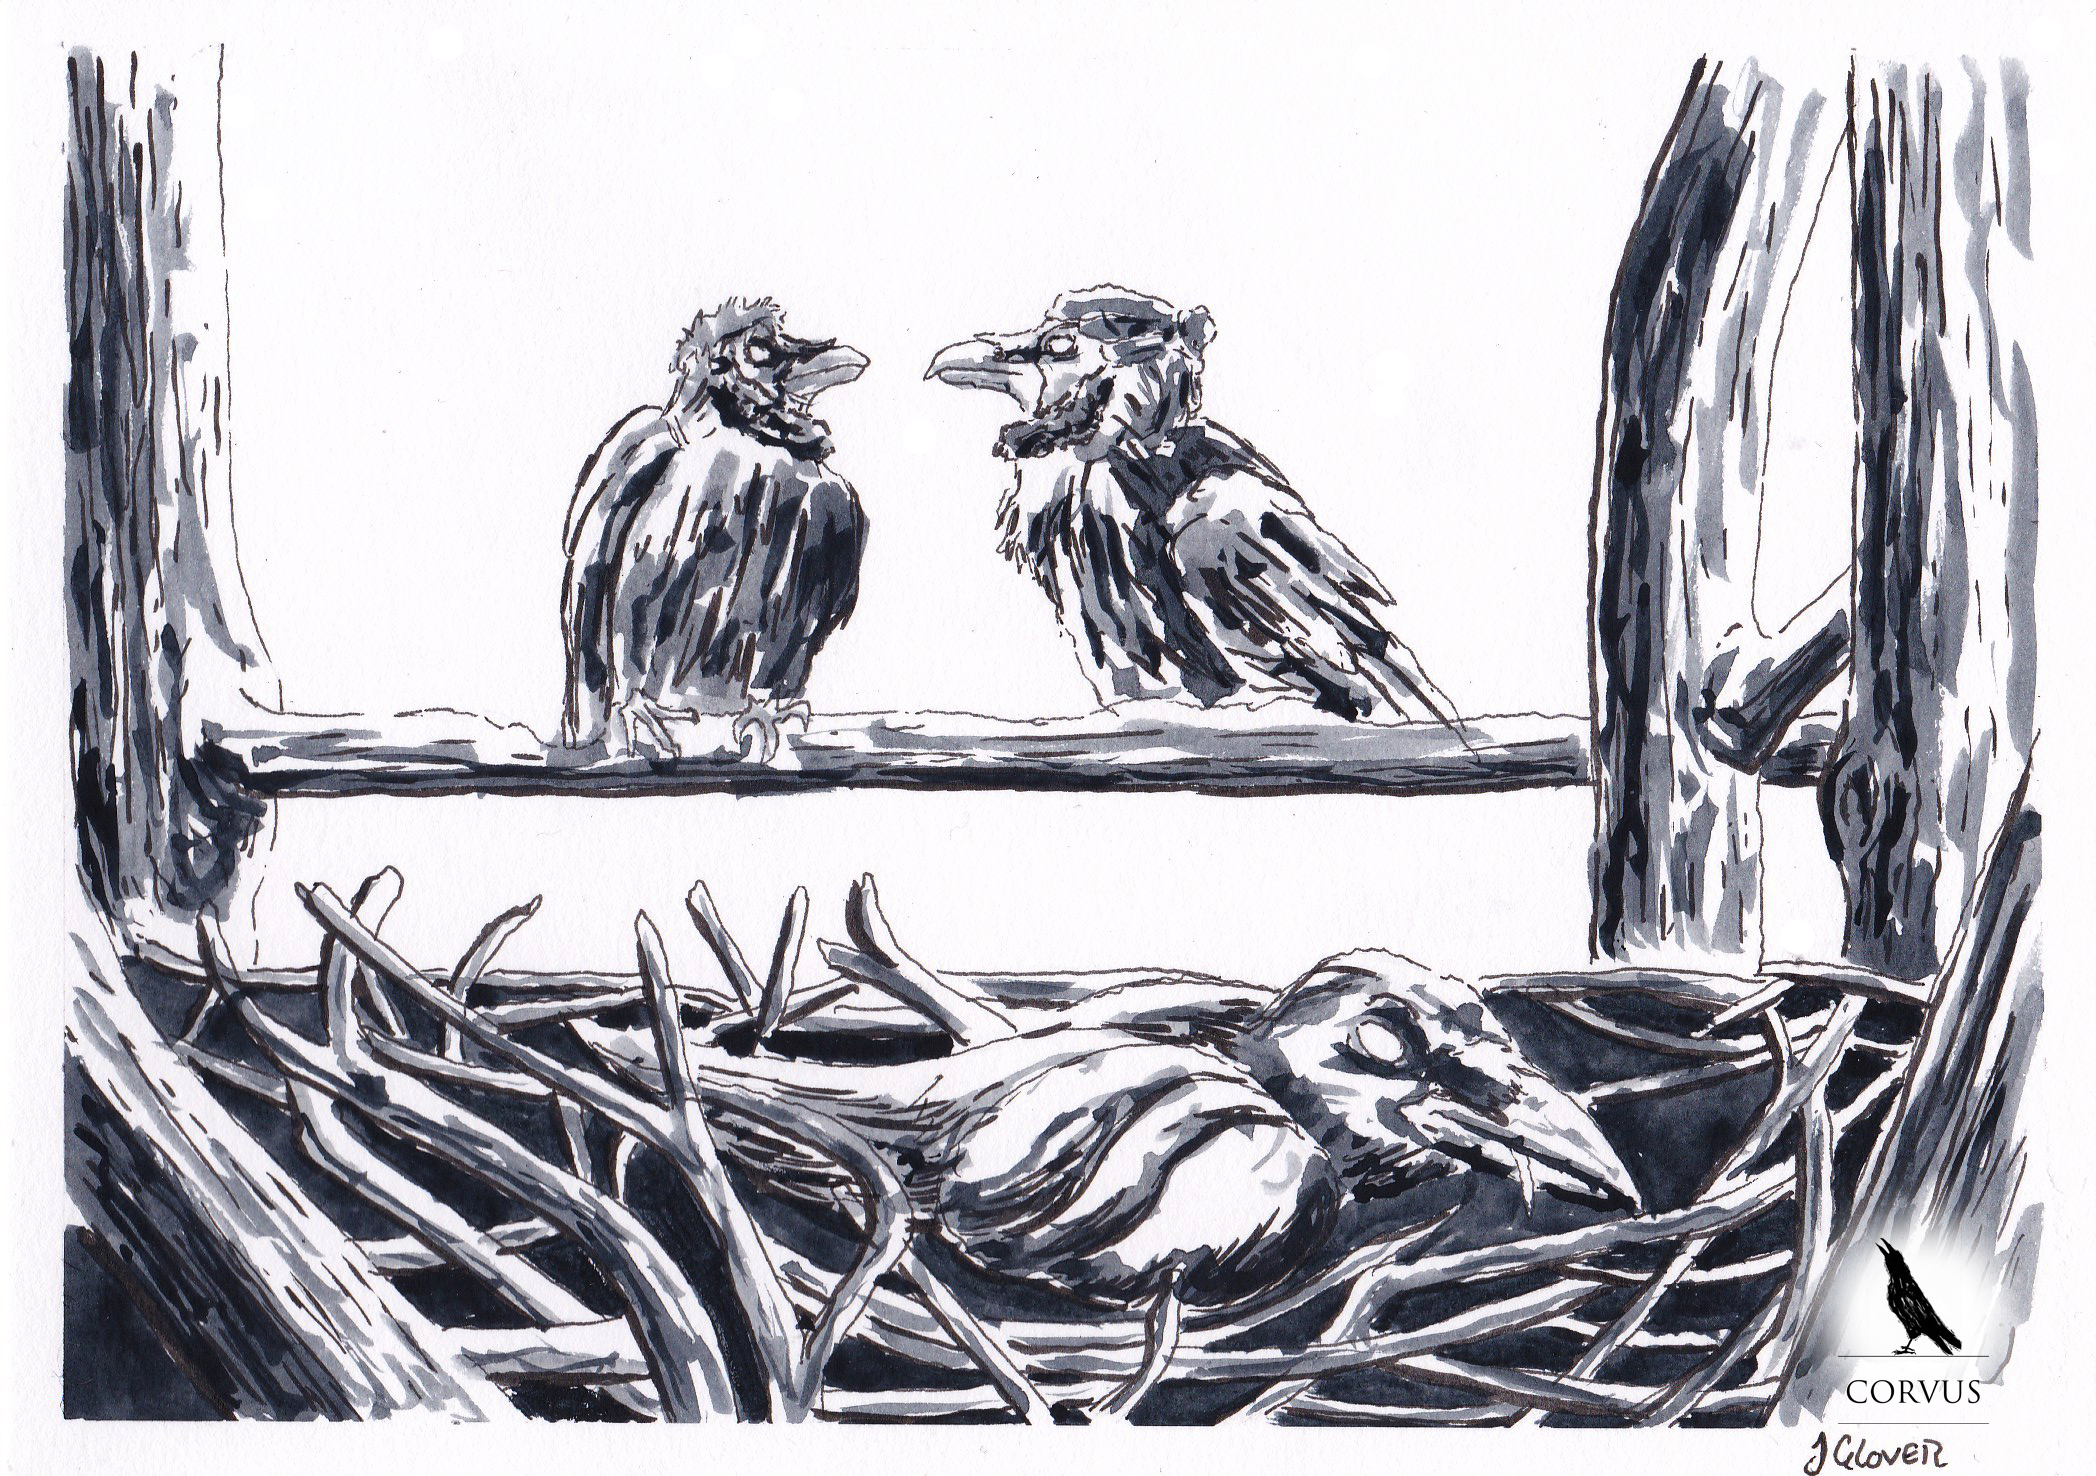 corvus - fantasy - graphic novel - art - illustration - story - crows - raven - ravens - webcomic